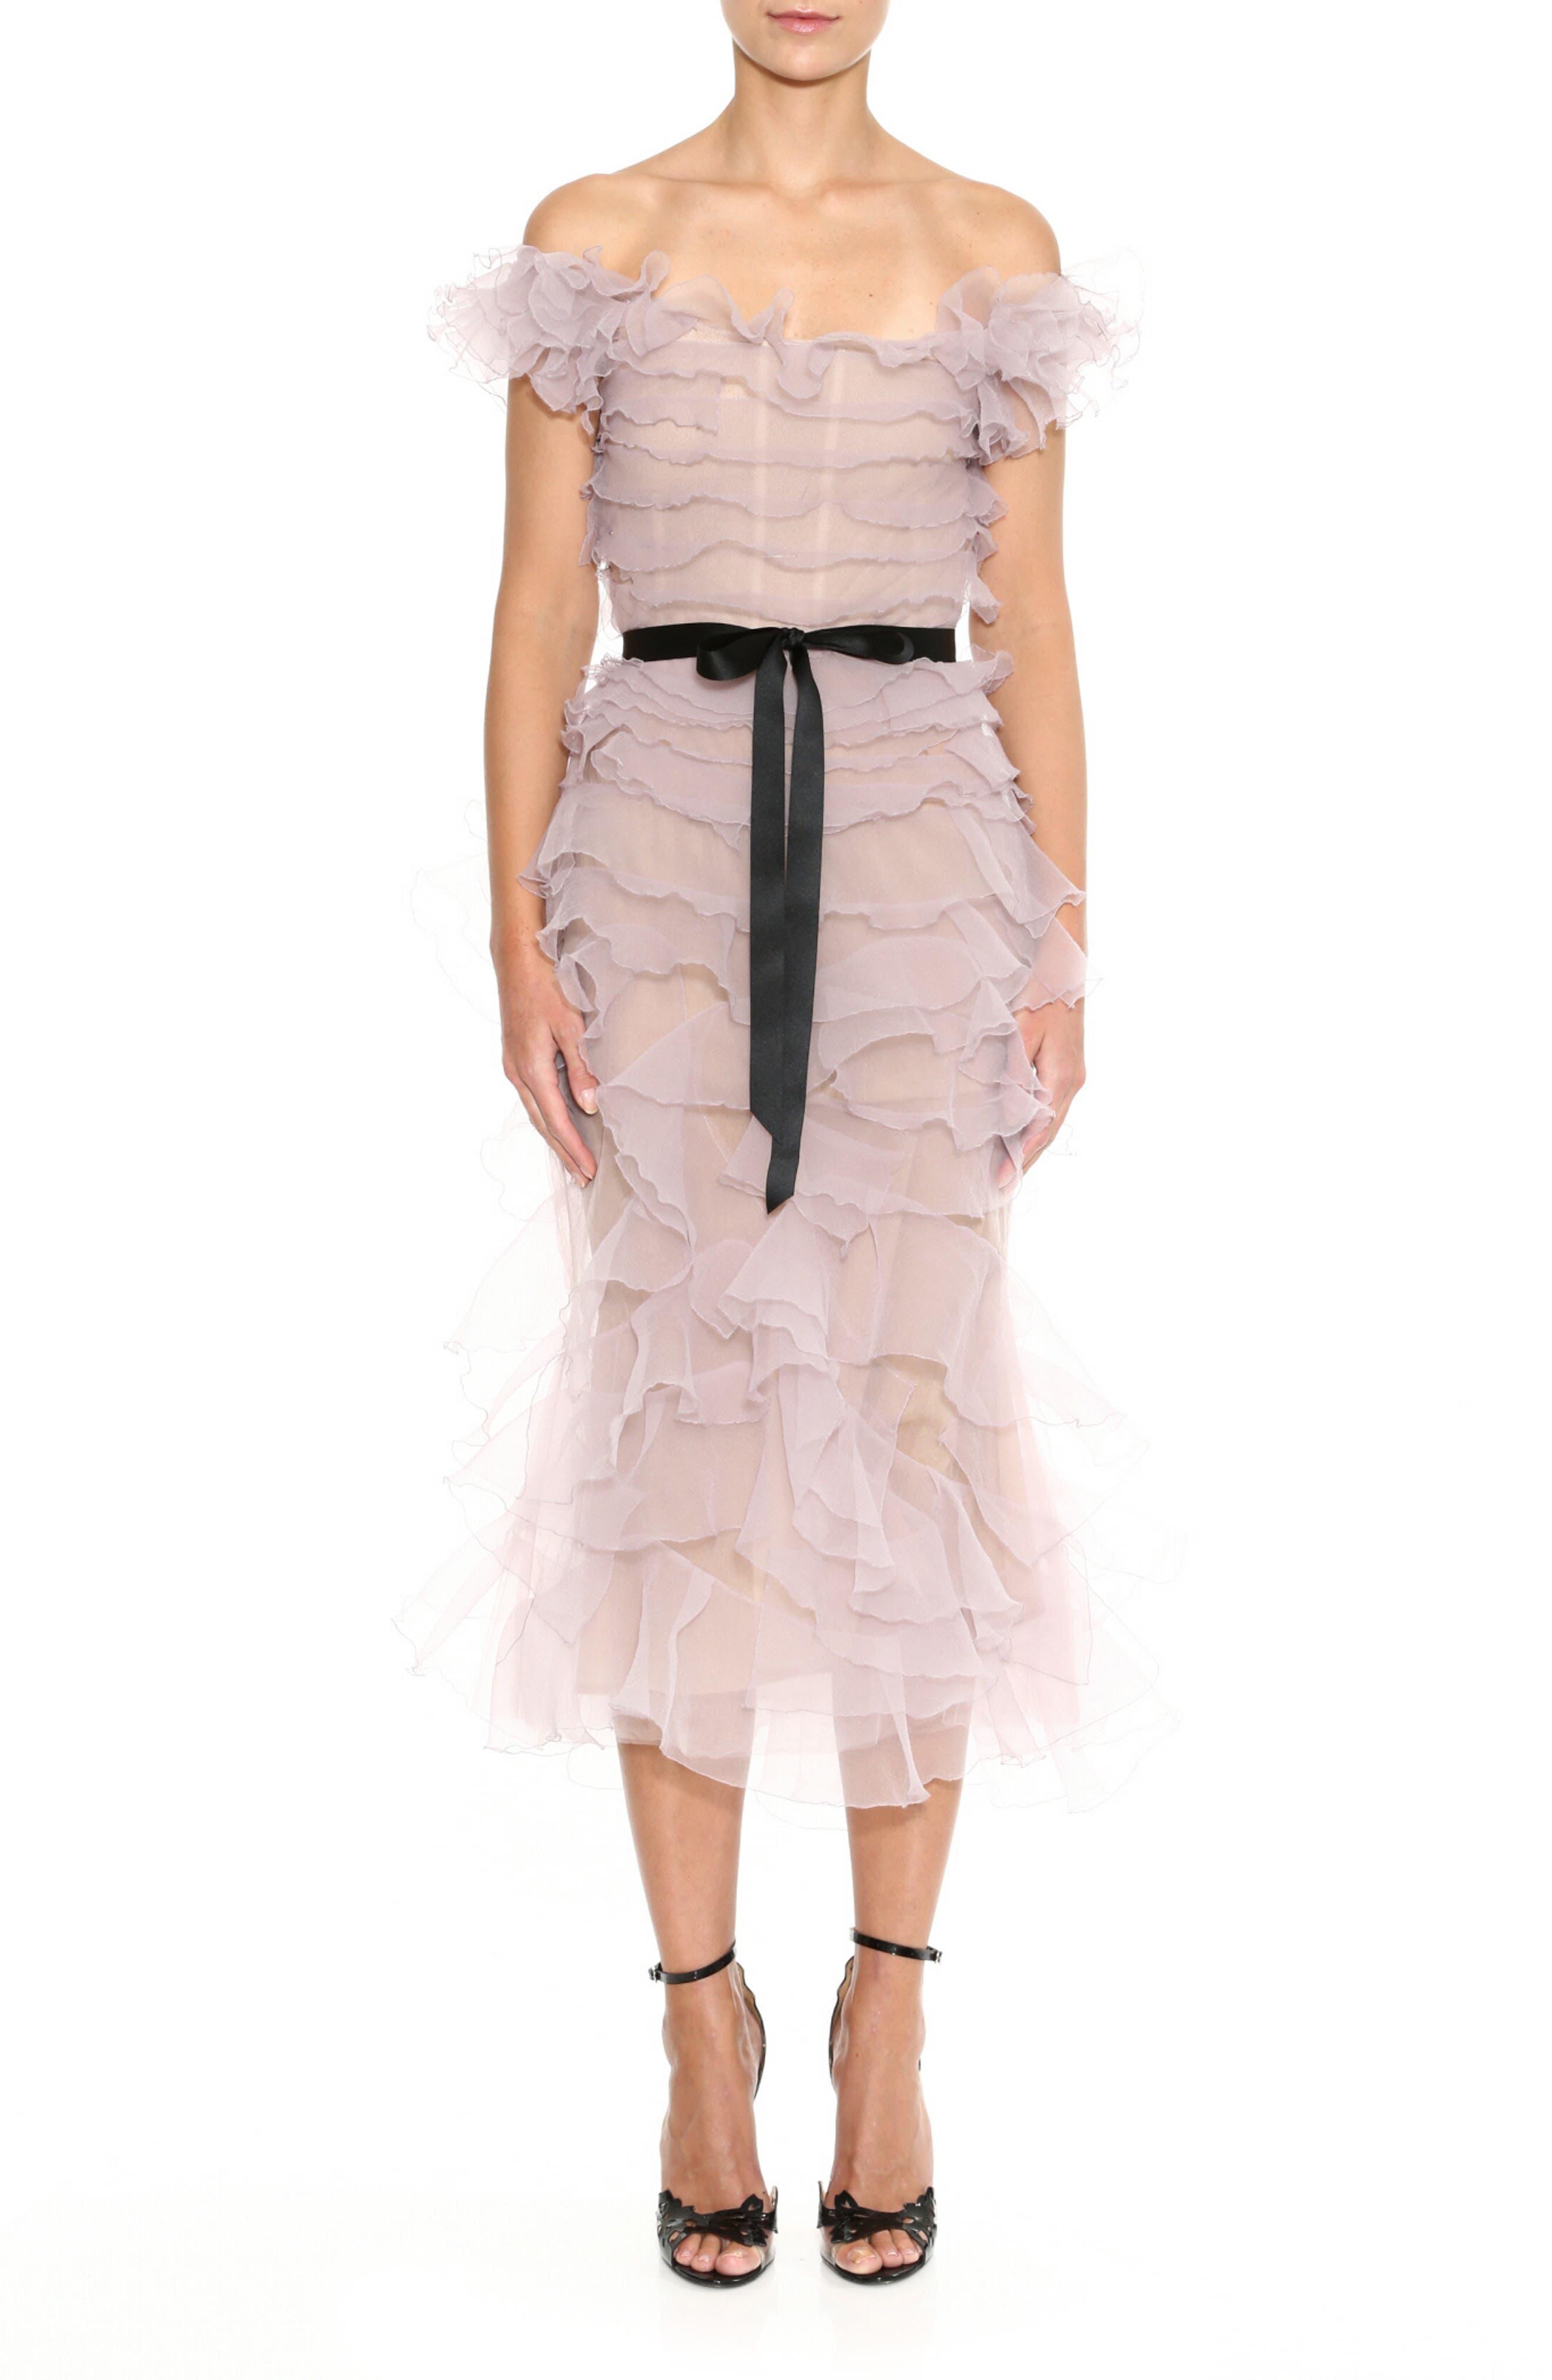 Women Lady Peplum Tulle Mesh Hem Ruffle Tutu Fashion Party Jumper Top Swearshirt